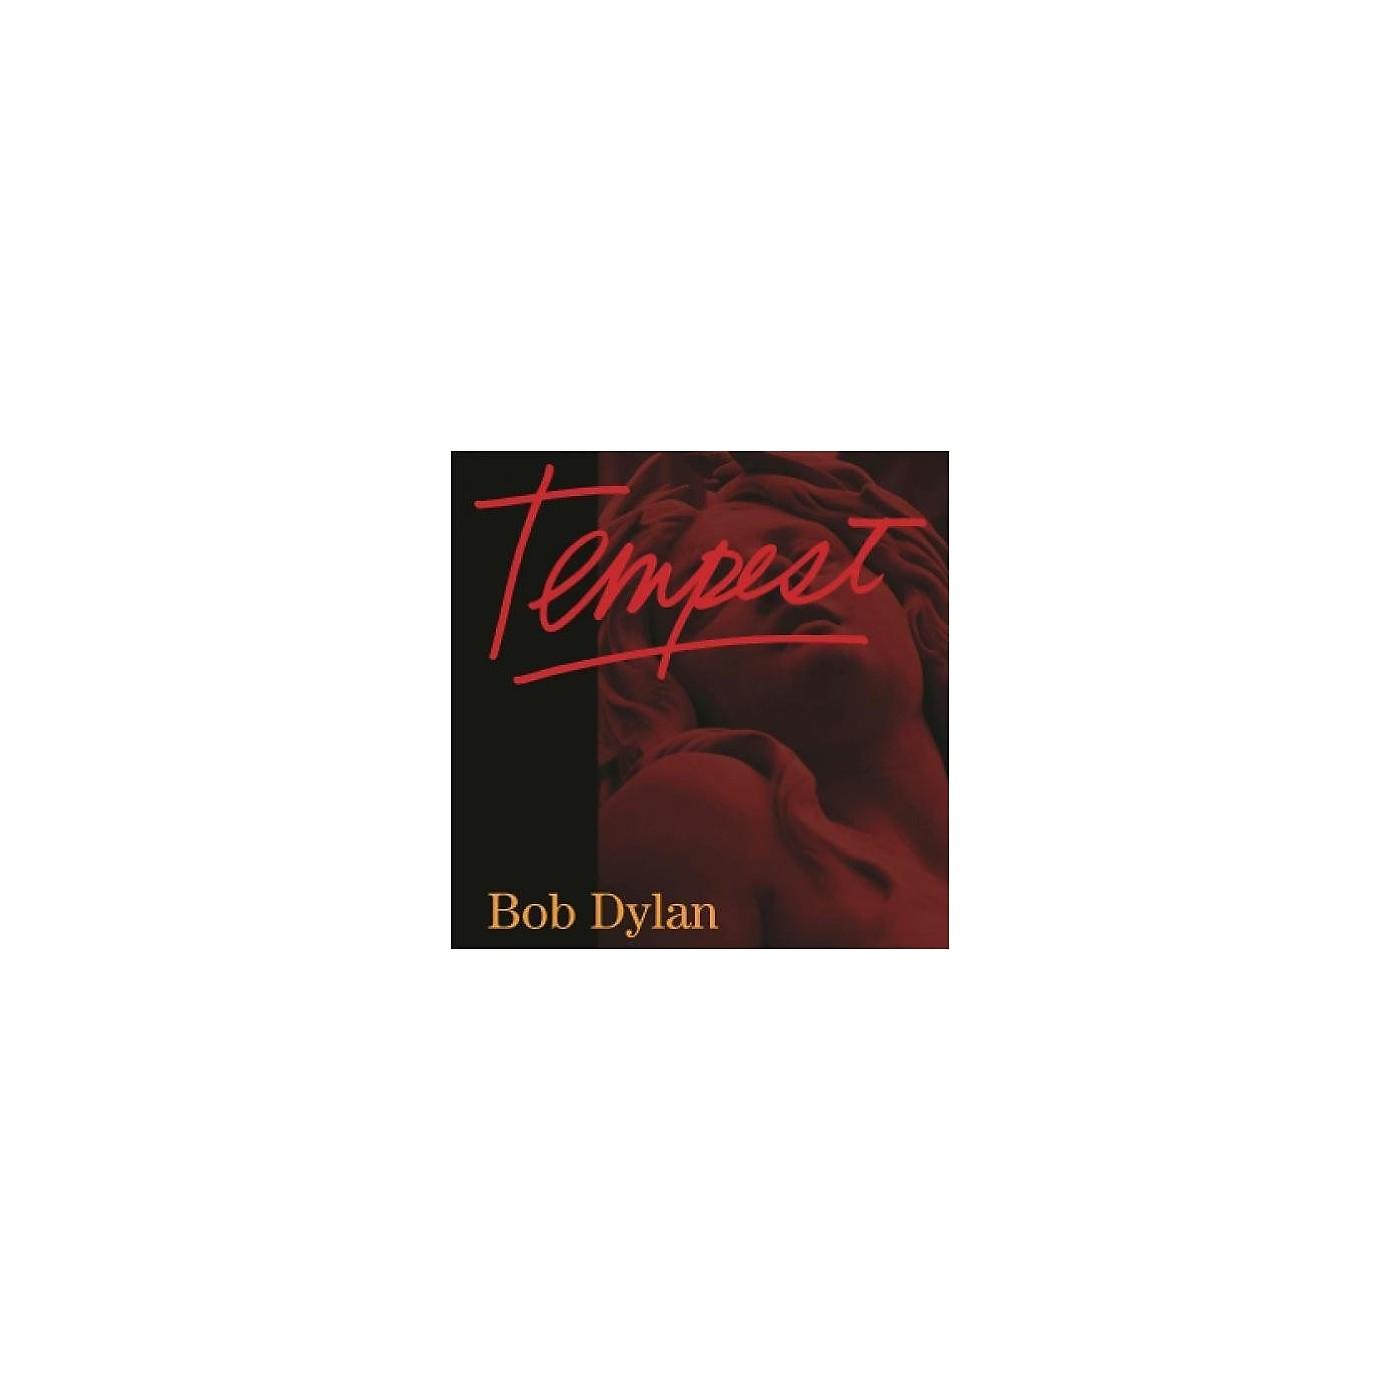 Alliance Bob Dylan - Tempest [2LP/1CD] thumbnail